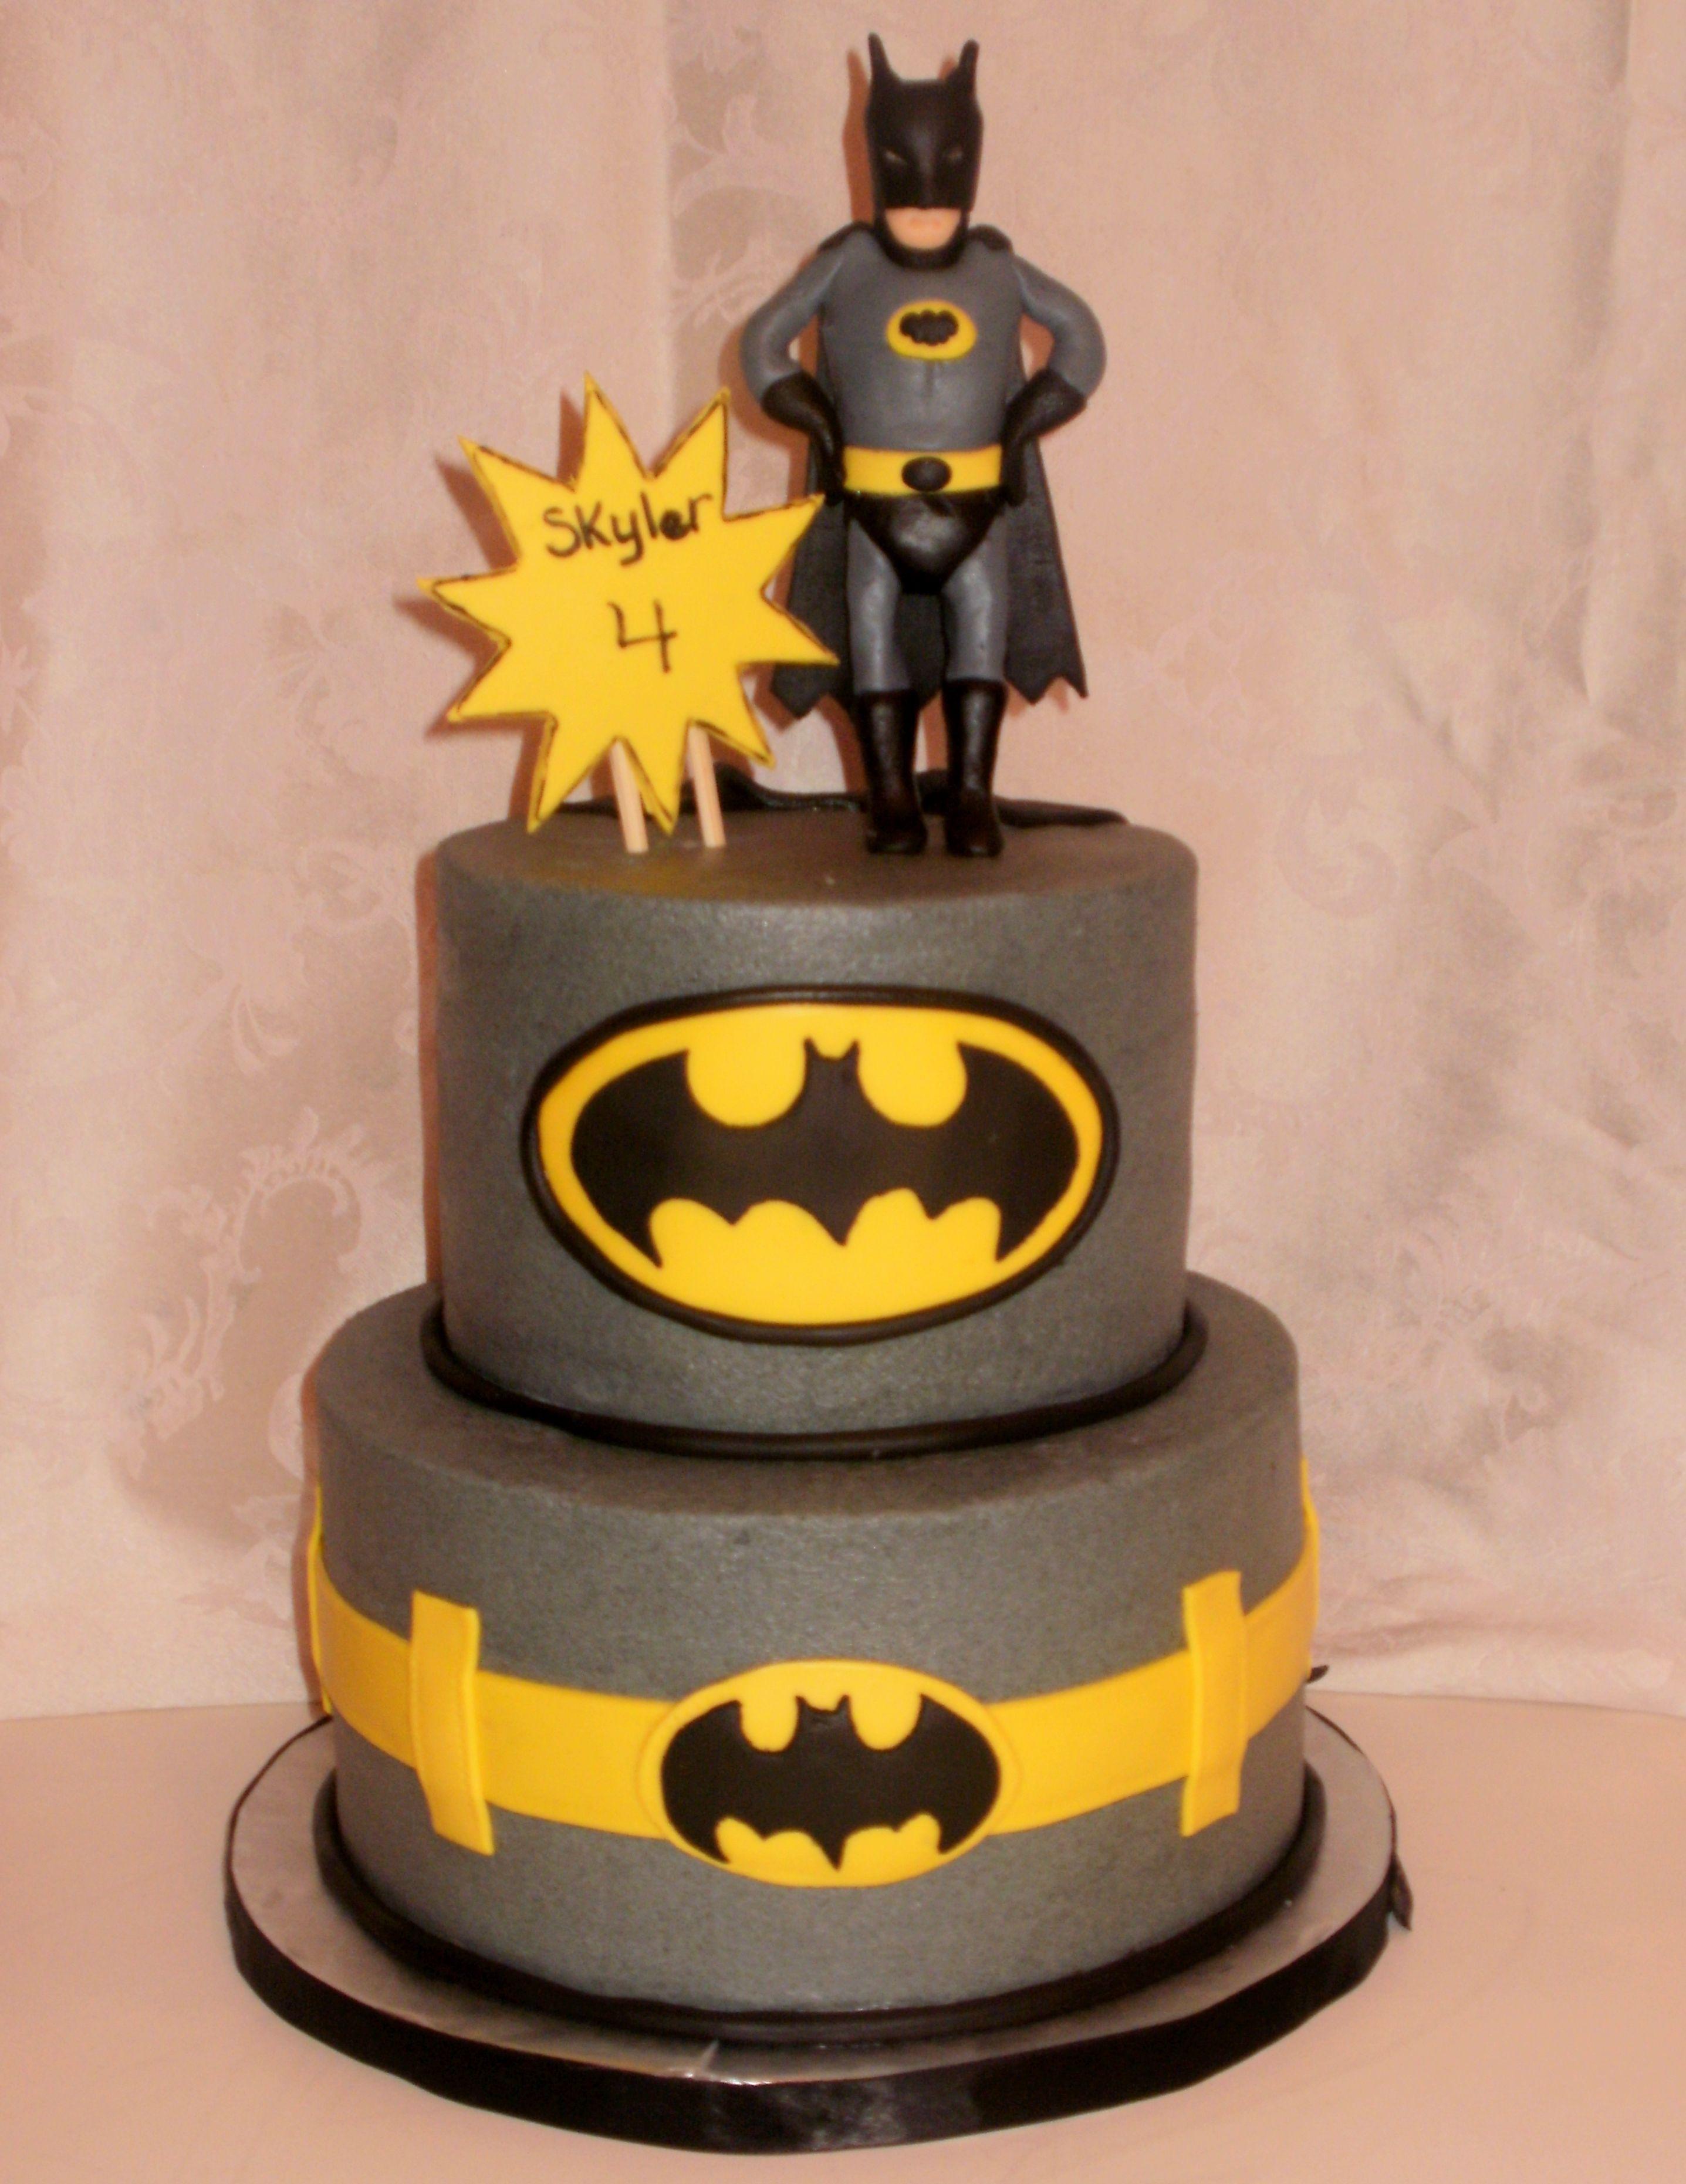 Phenomenal Batman With Images Batman Birthday Cakes Batman Cakes Batman Funny Birthday Cards Online Bapapcheapnameinfo